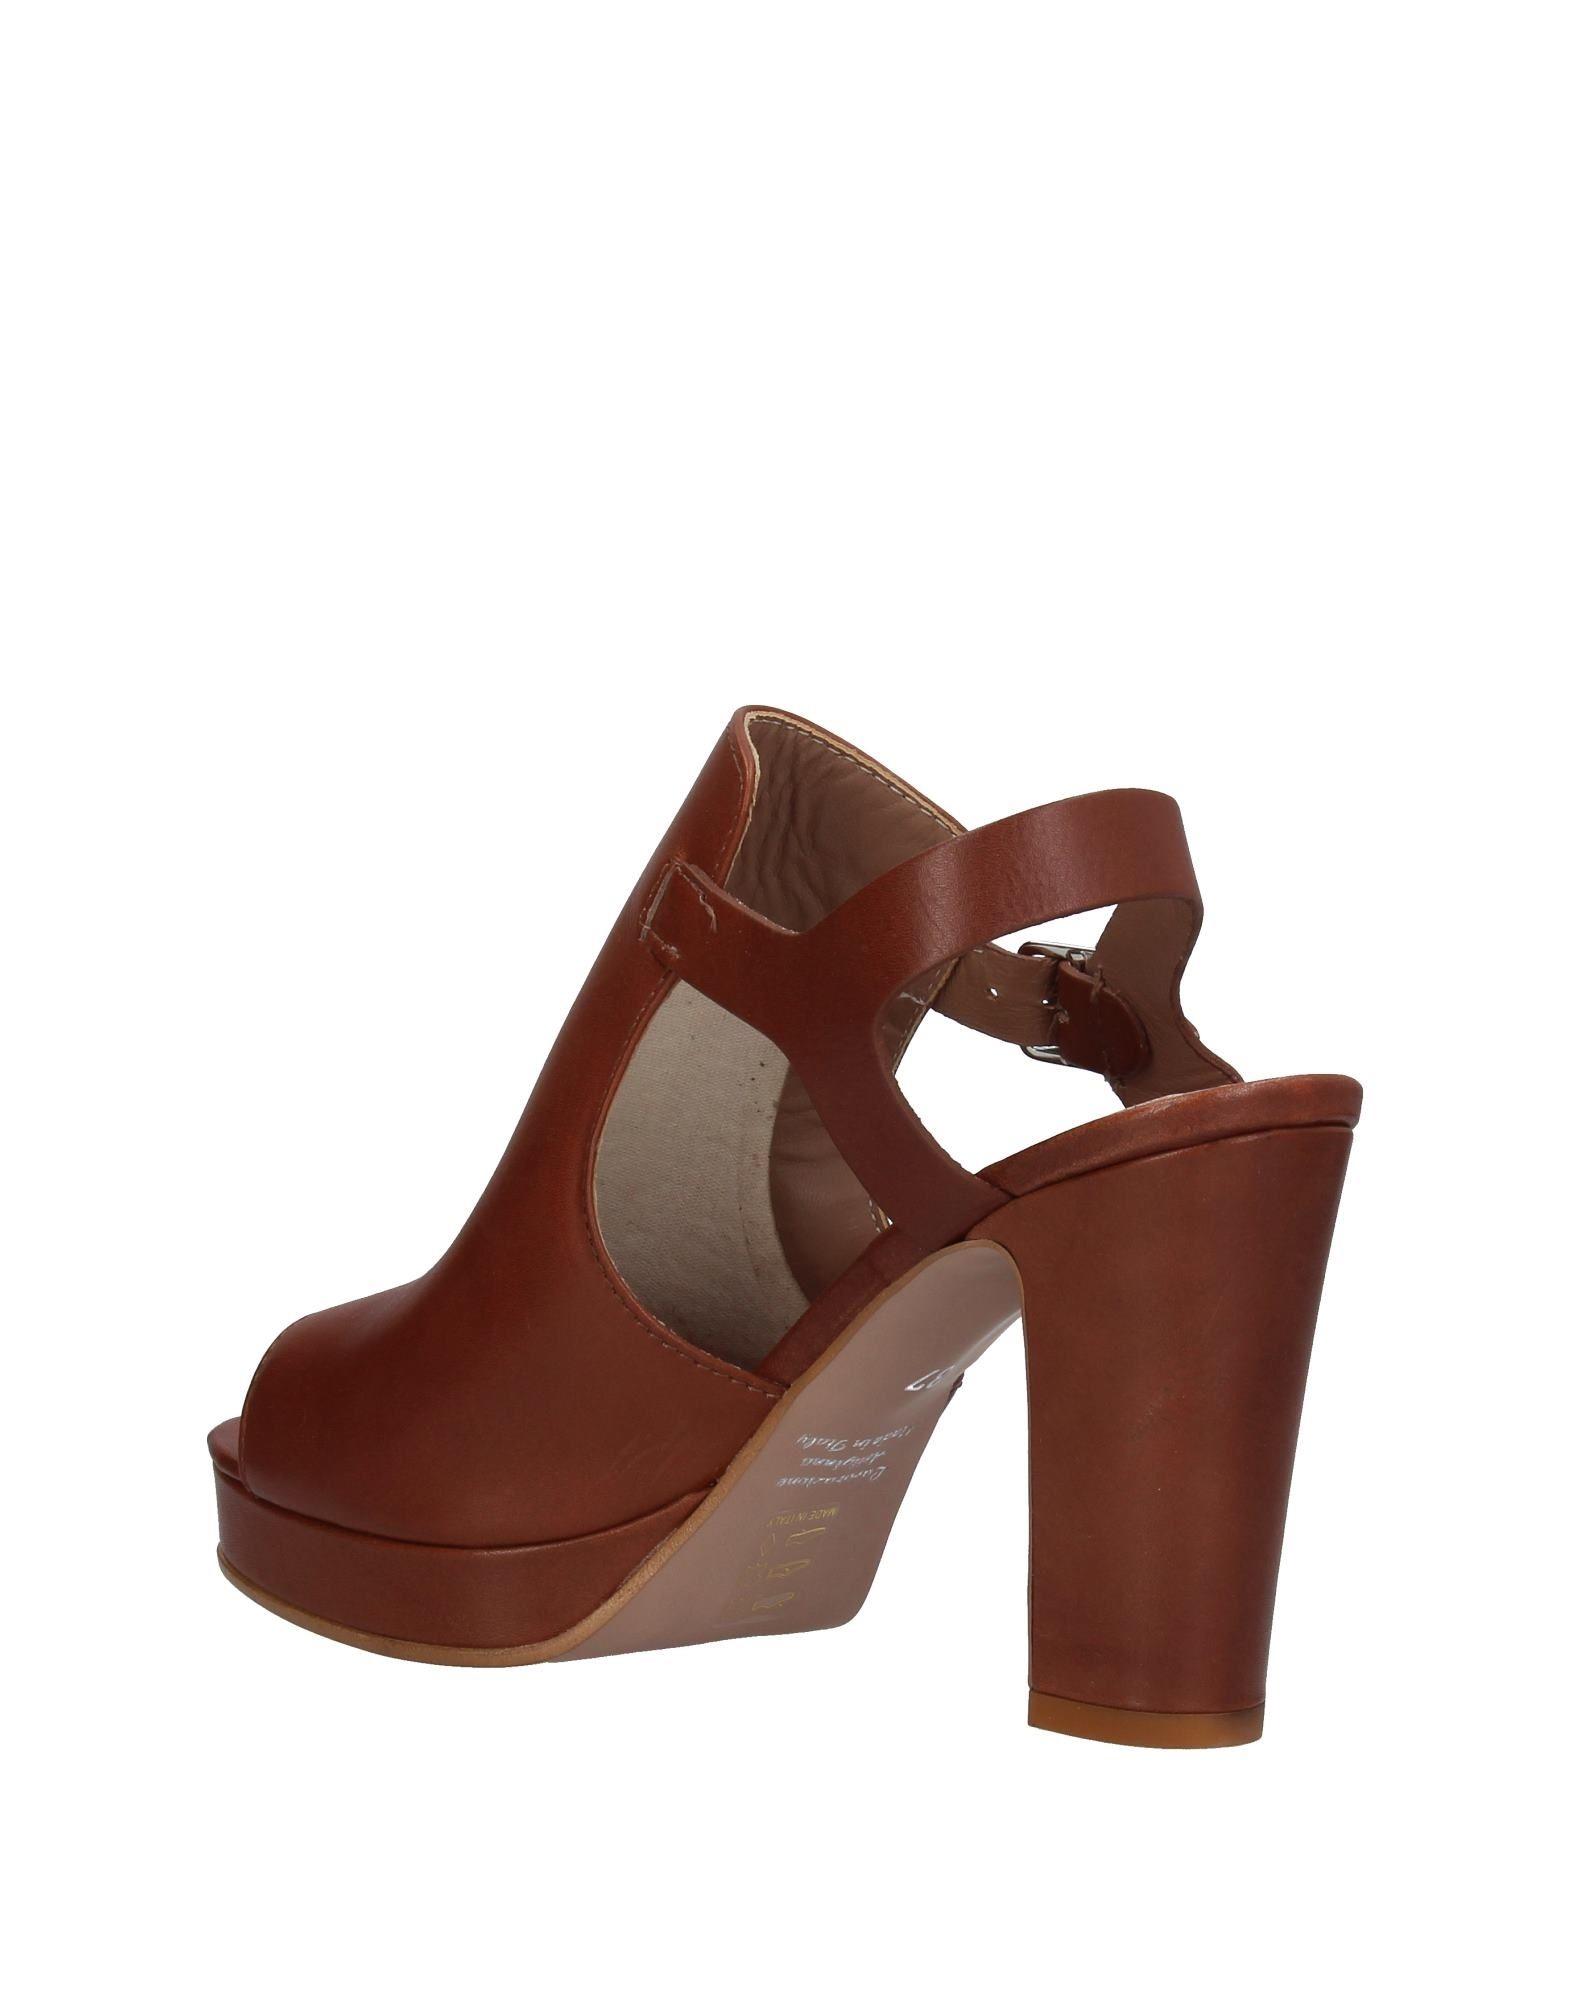 Mally Heiße Sandalen Damen  11376064MG Heiße Mally Schuhe 8bb2f7